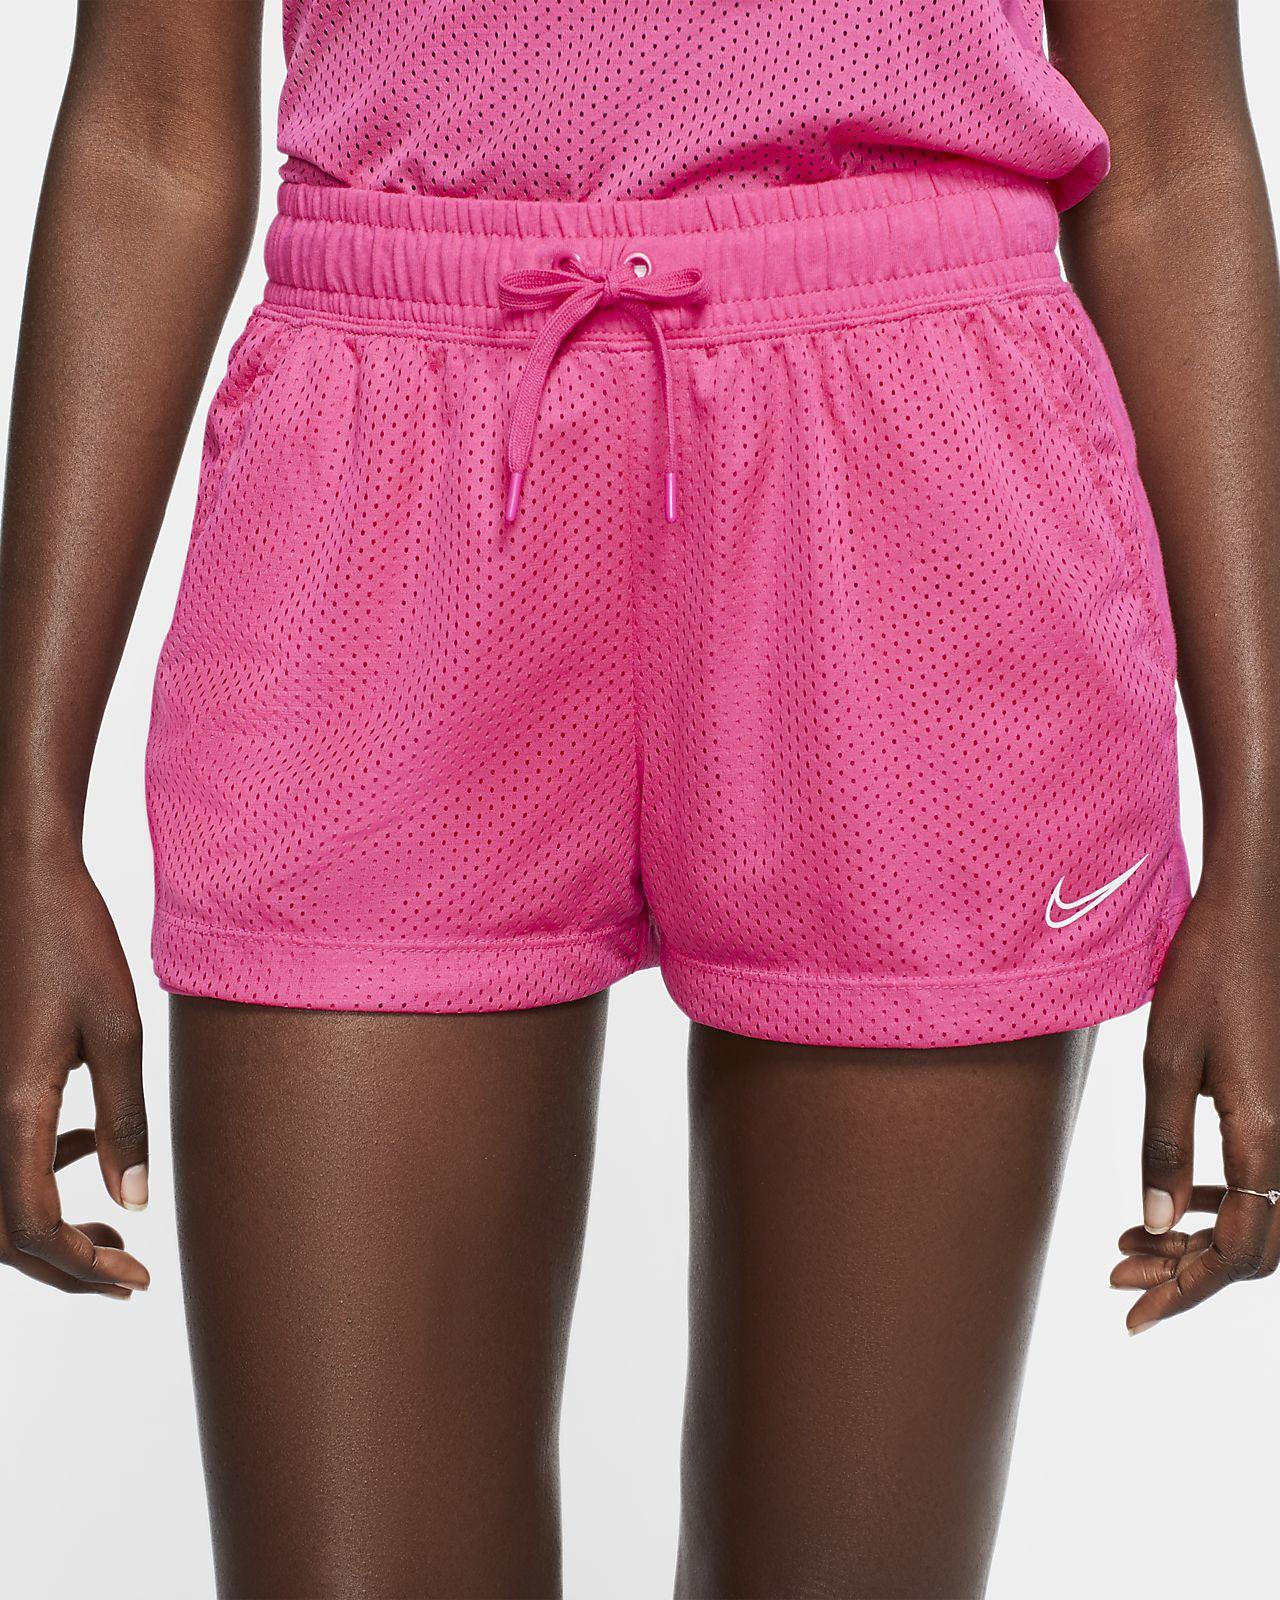 Nike Sportswear Women's Mesh Shorts